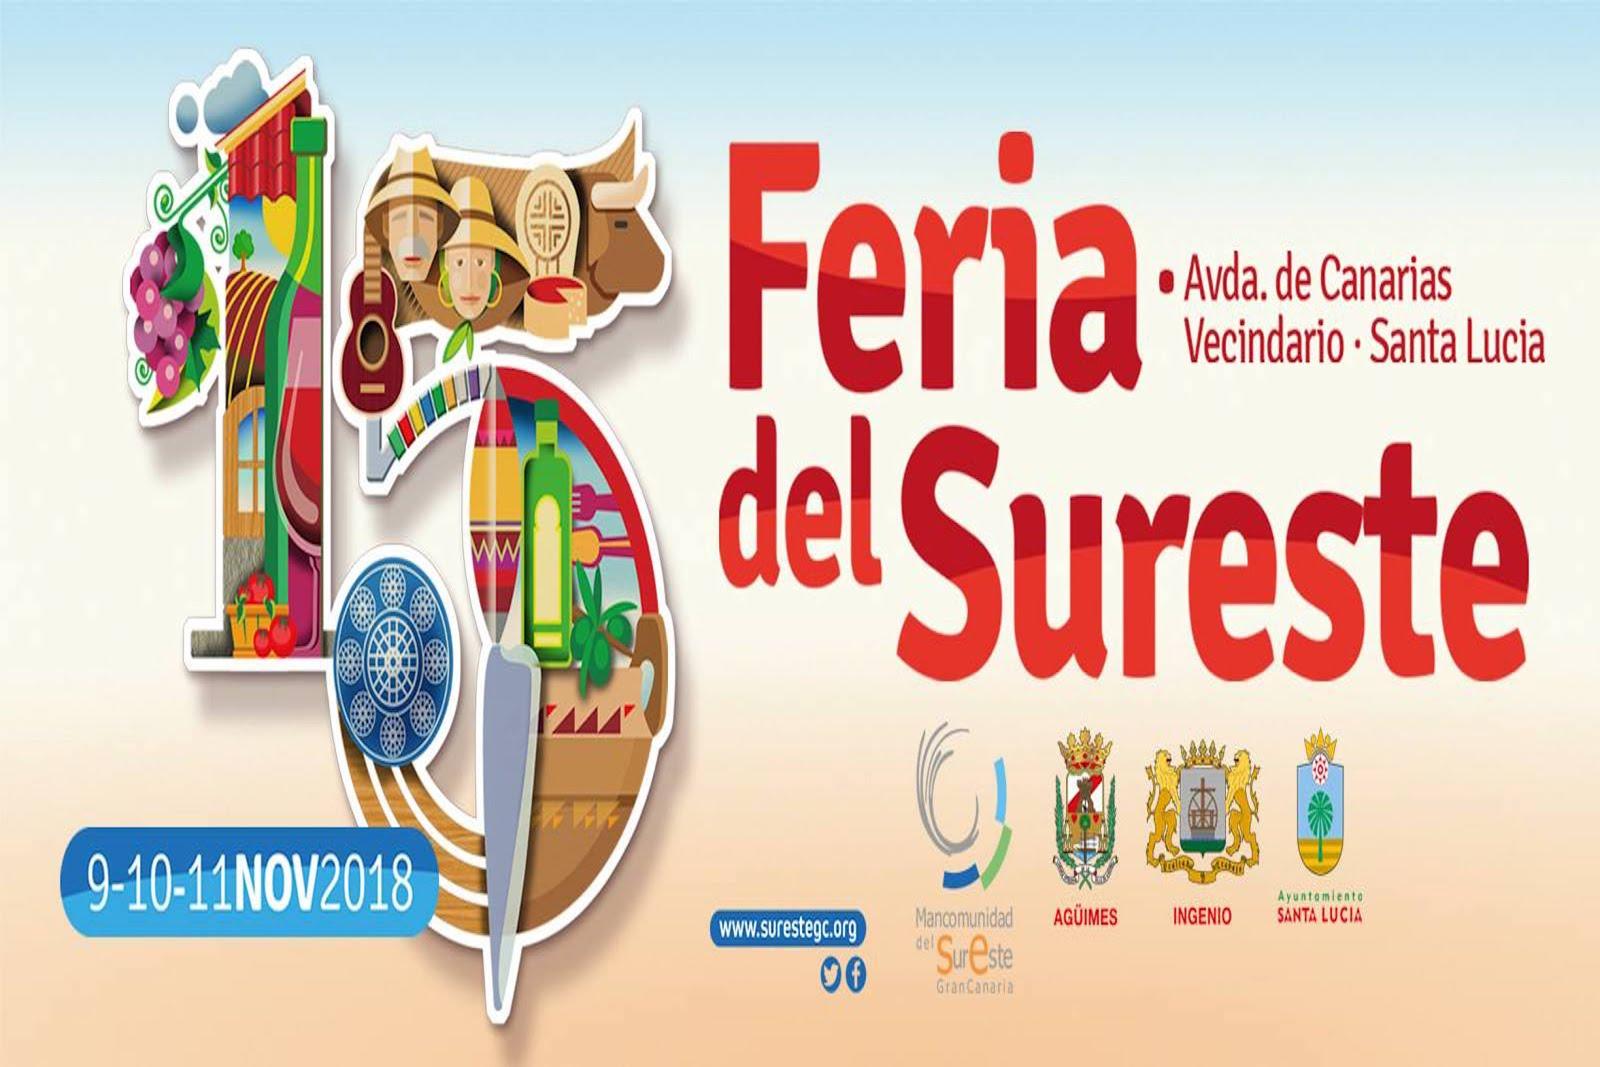 15ª Feria del Sureste